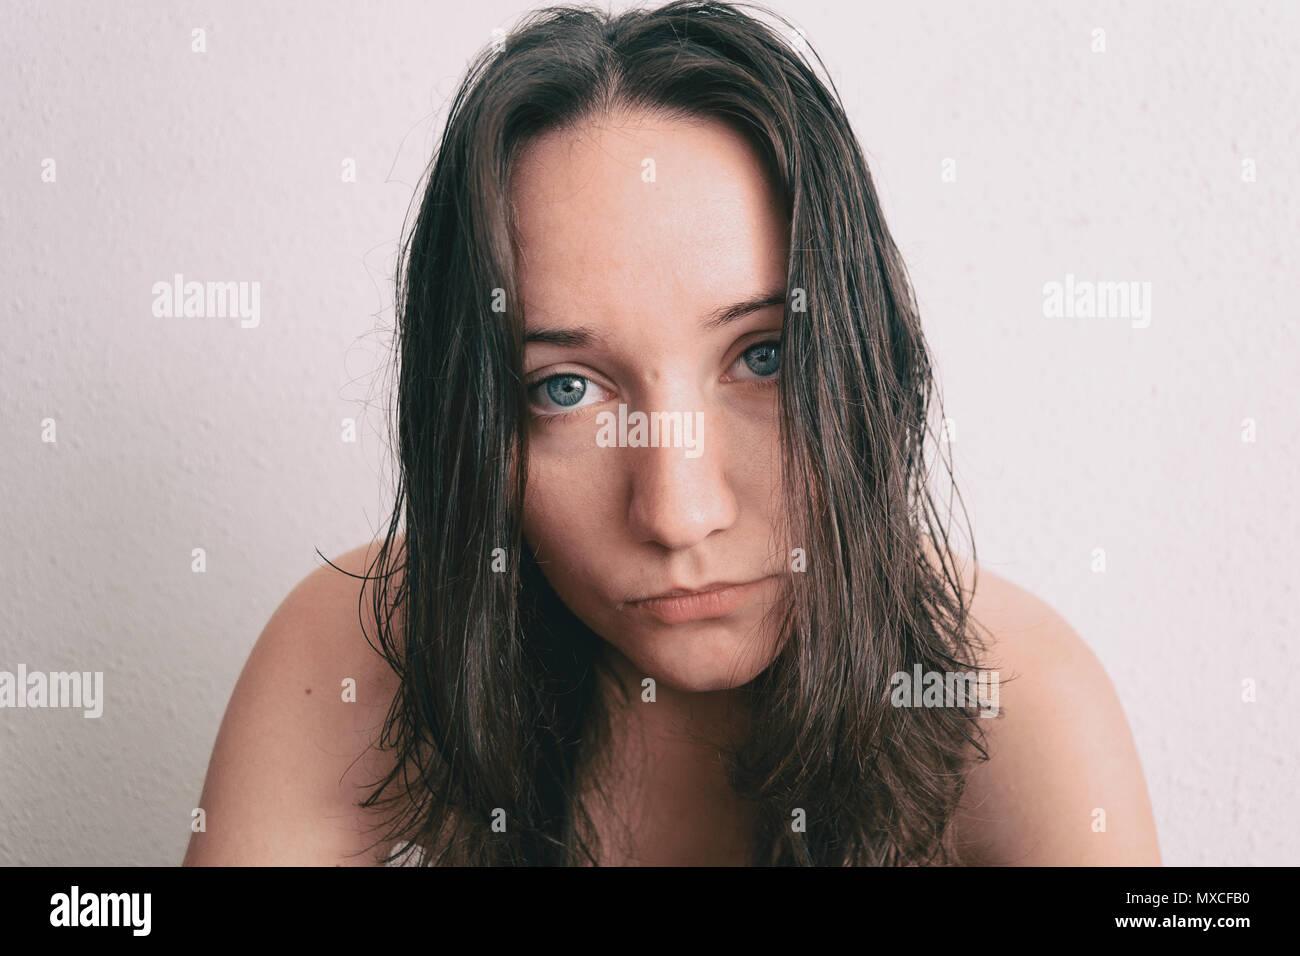 0e8e7d1e3b17f8 Girl Black Hair And Blue Eyes Stock Photos   Girl Black Hair And ...